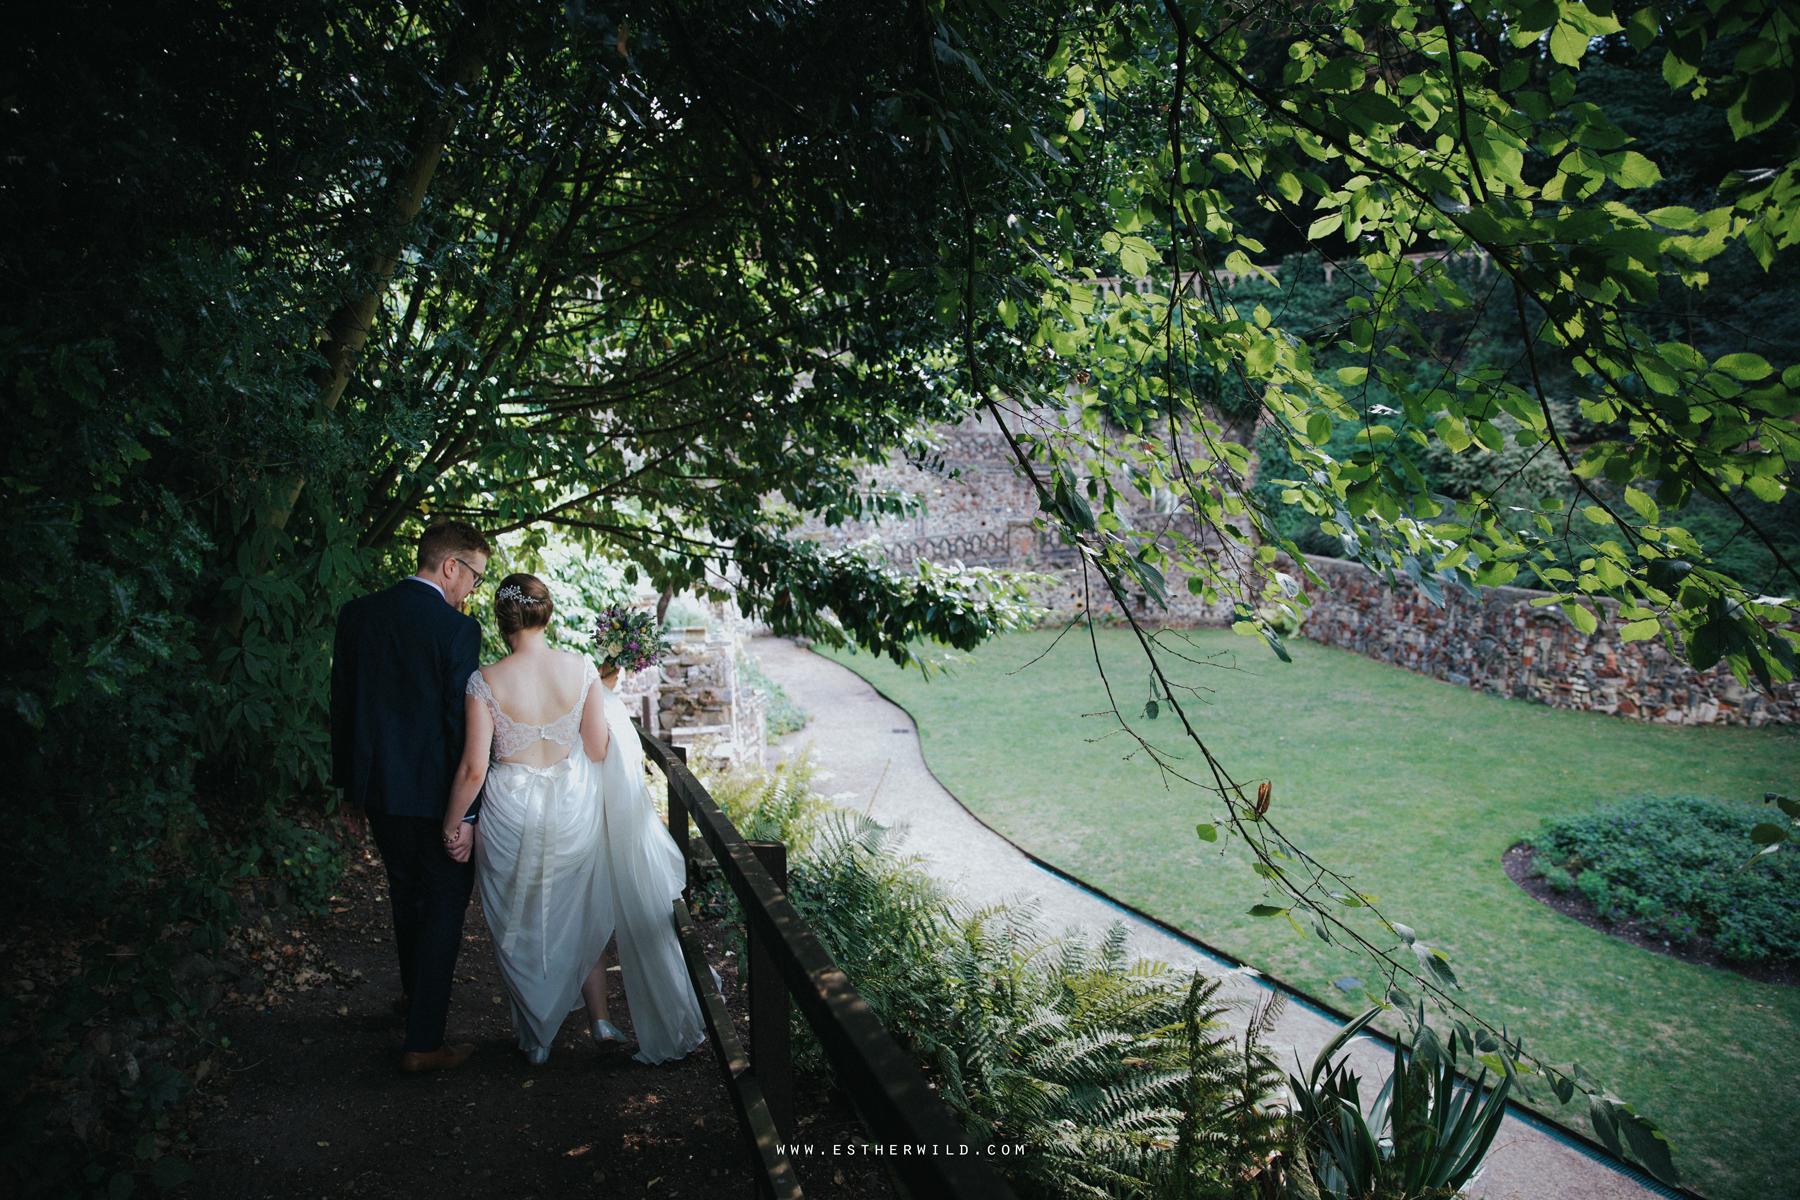 The_Georgian_Townhouse_Wedding_Norwich_Esther_Wild_Photographer_3R8A1762.jpg